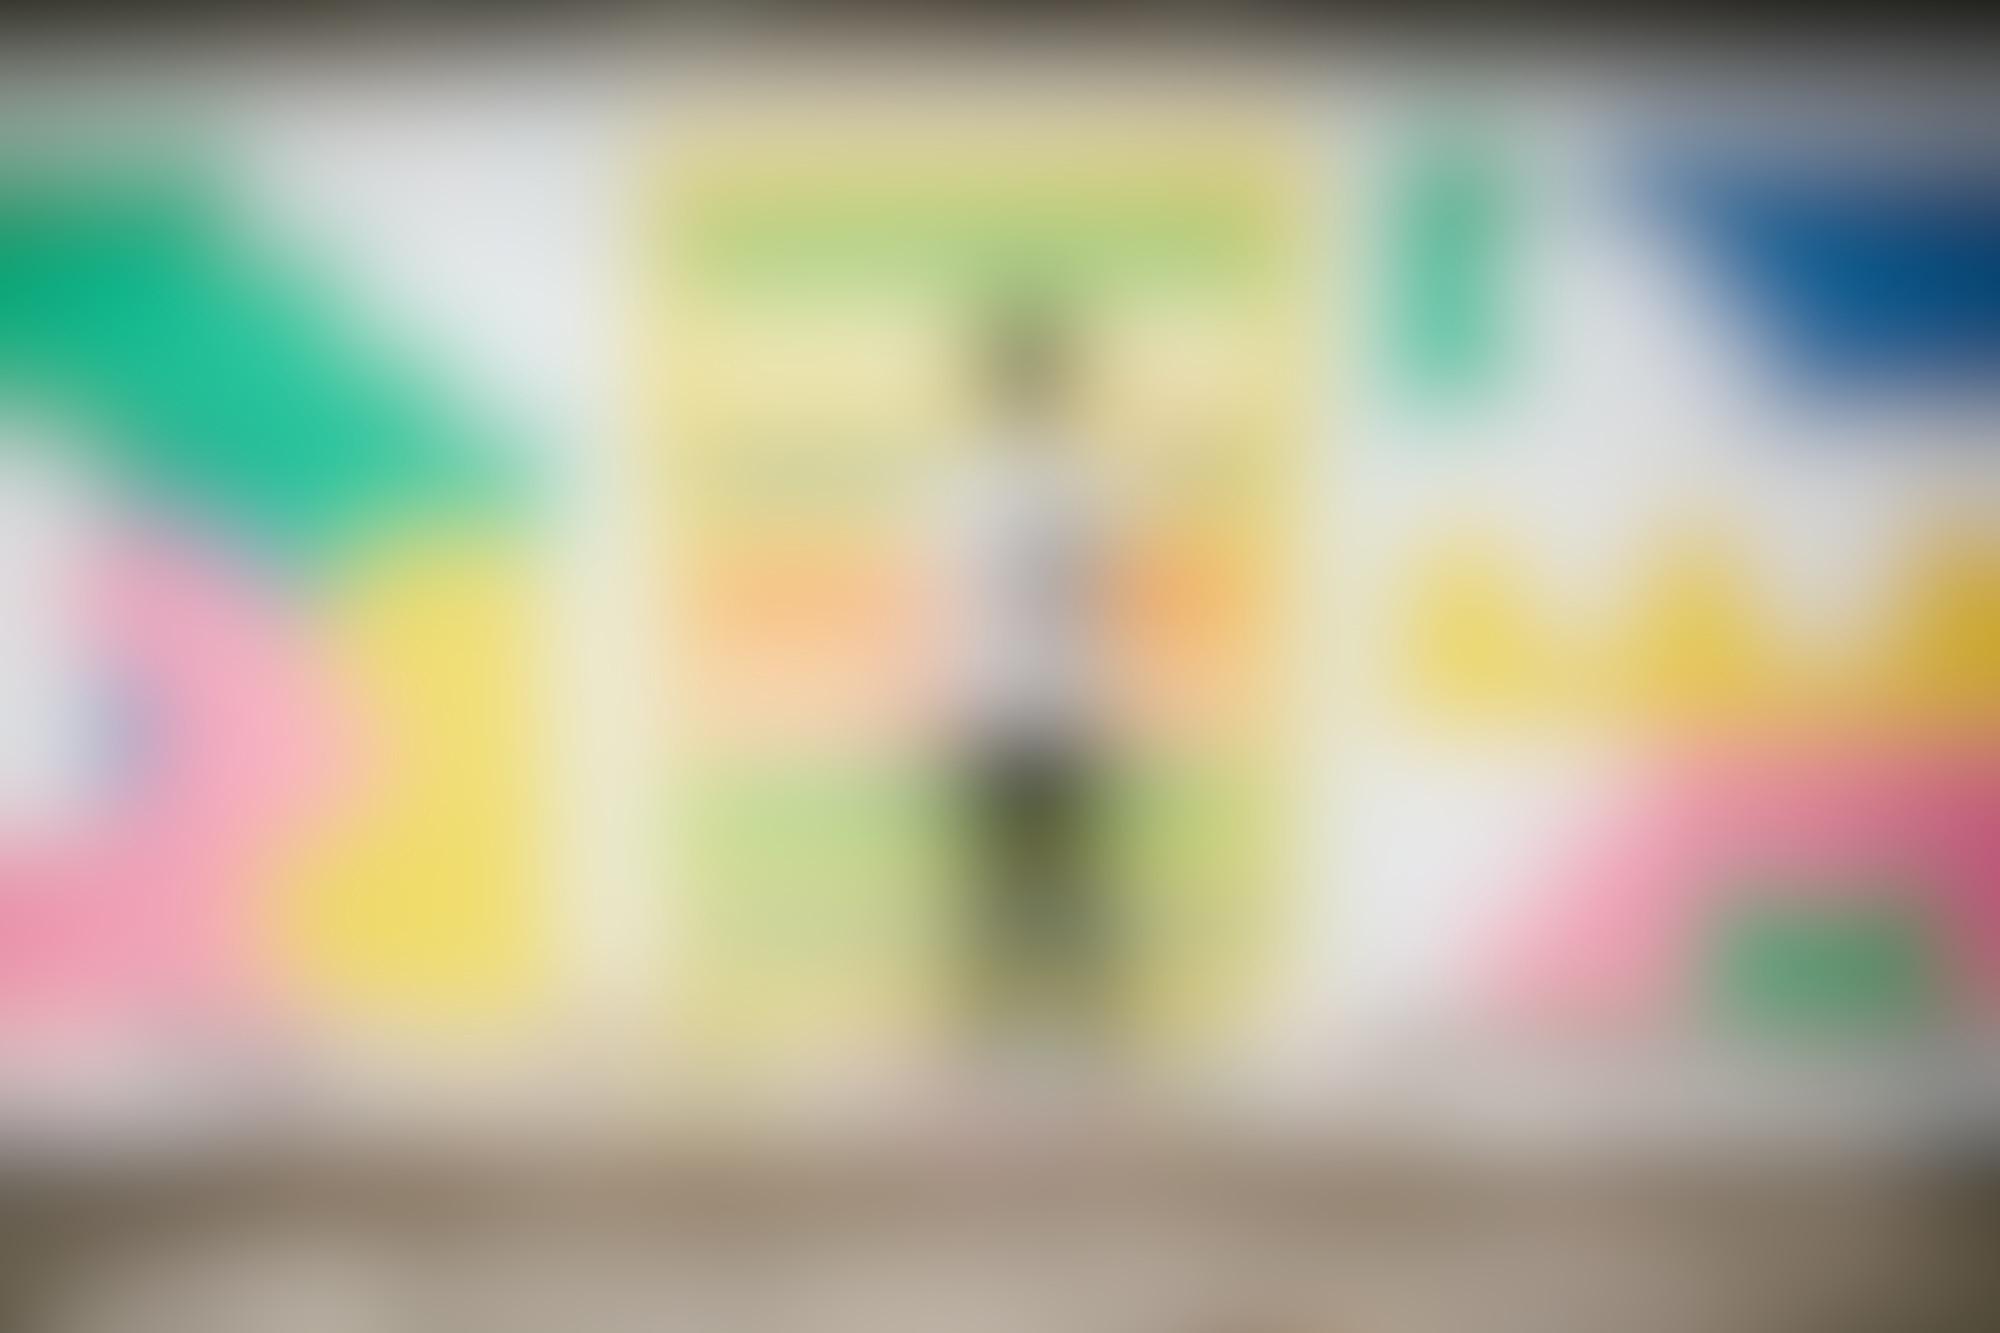 RISOTTO x Puma 2016 Puma Suede Ad Campaign autocompressfitresizeixlibphp 1 1 0max h2000max w3 D2000q80sfa5f30a6a40742c52b5a416f56bd8c80